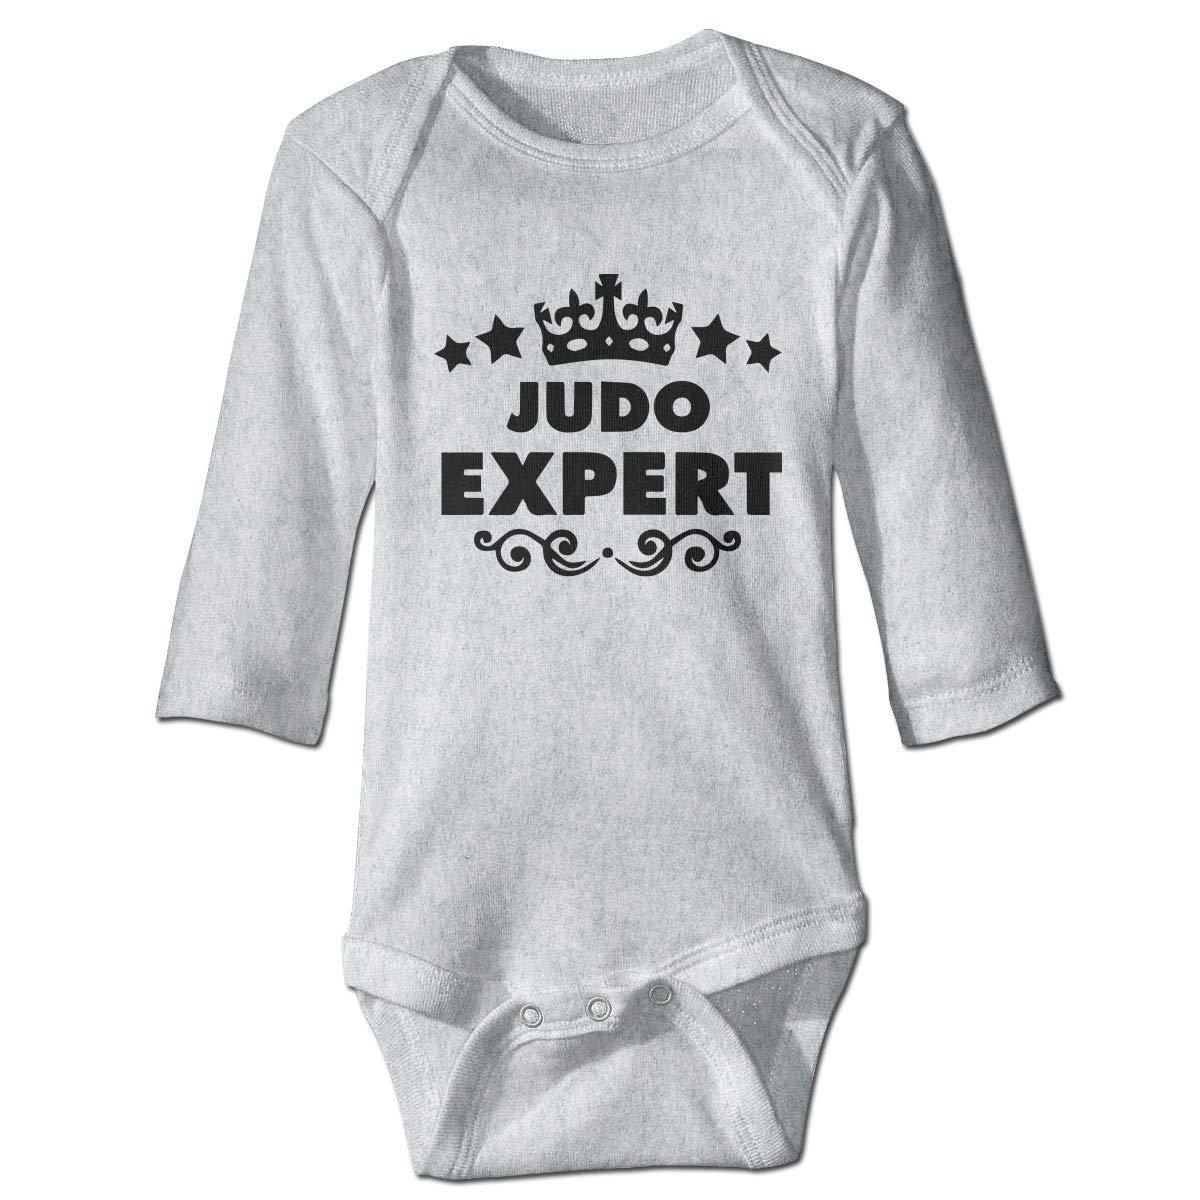 A14UBP Newborn Infant Baby Girls Boys Romper Bodysuit Infant Judo Expert Long Sleeve Funny Jumpsuit Romper